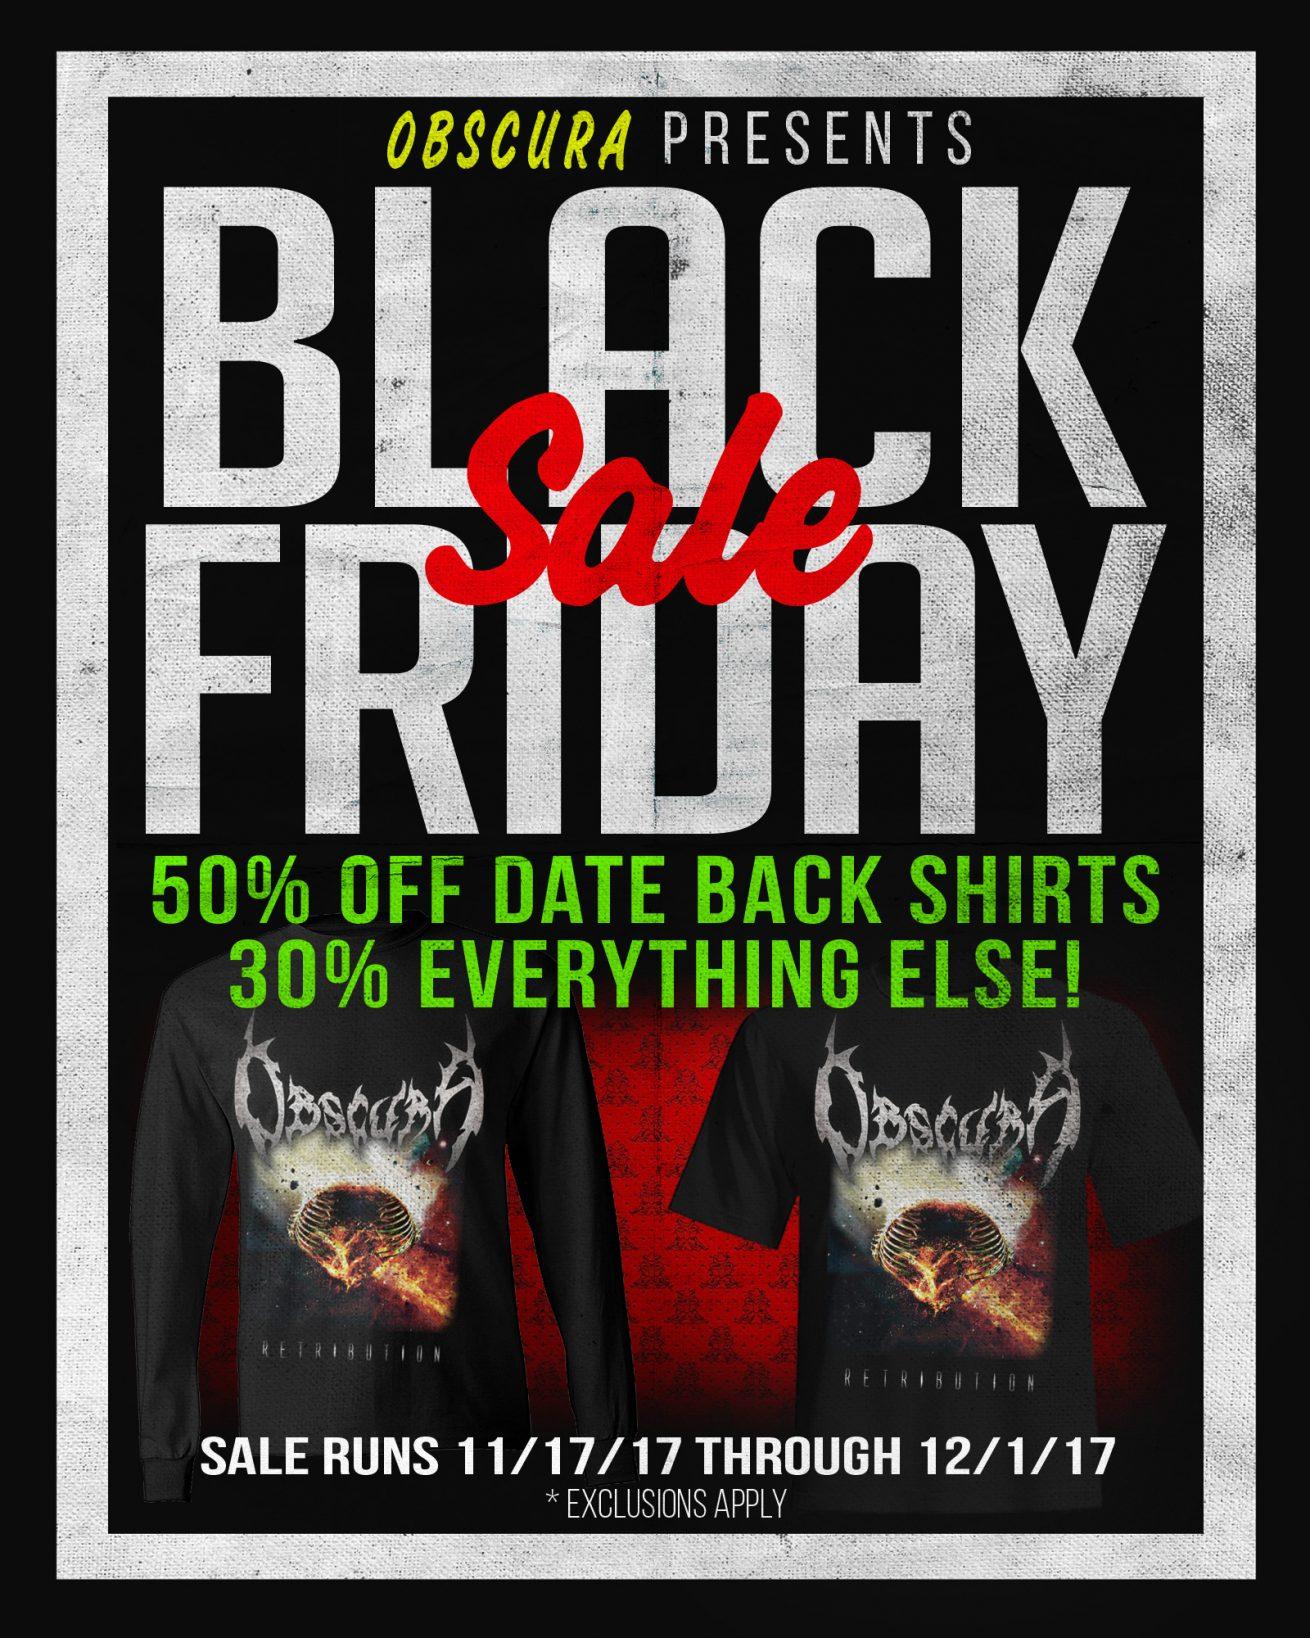 Obscura   Black Friday Sales through JSR Merchandising